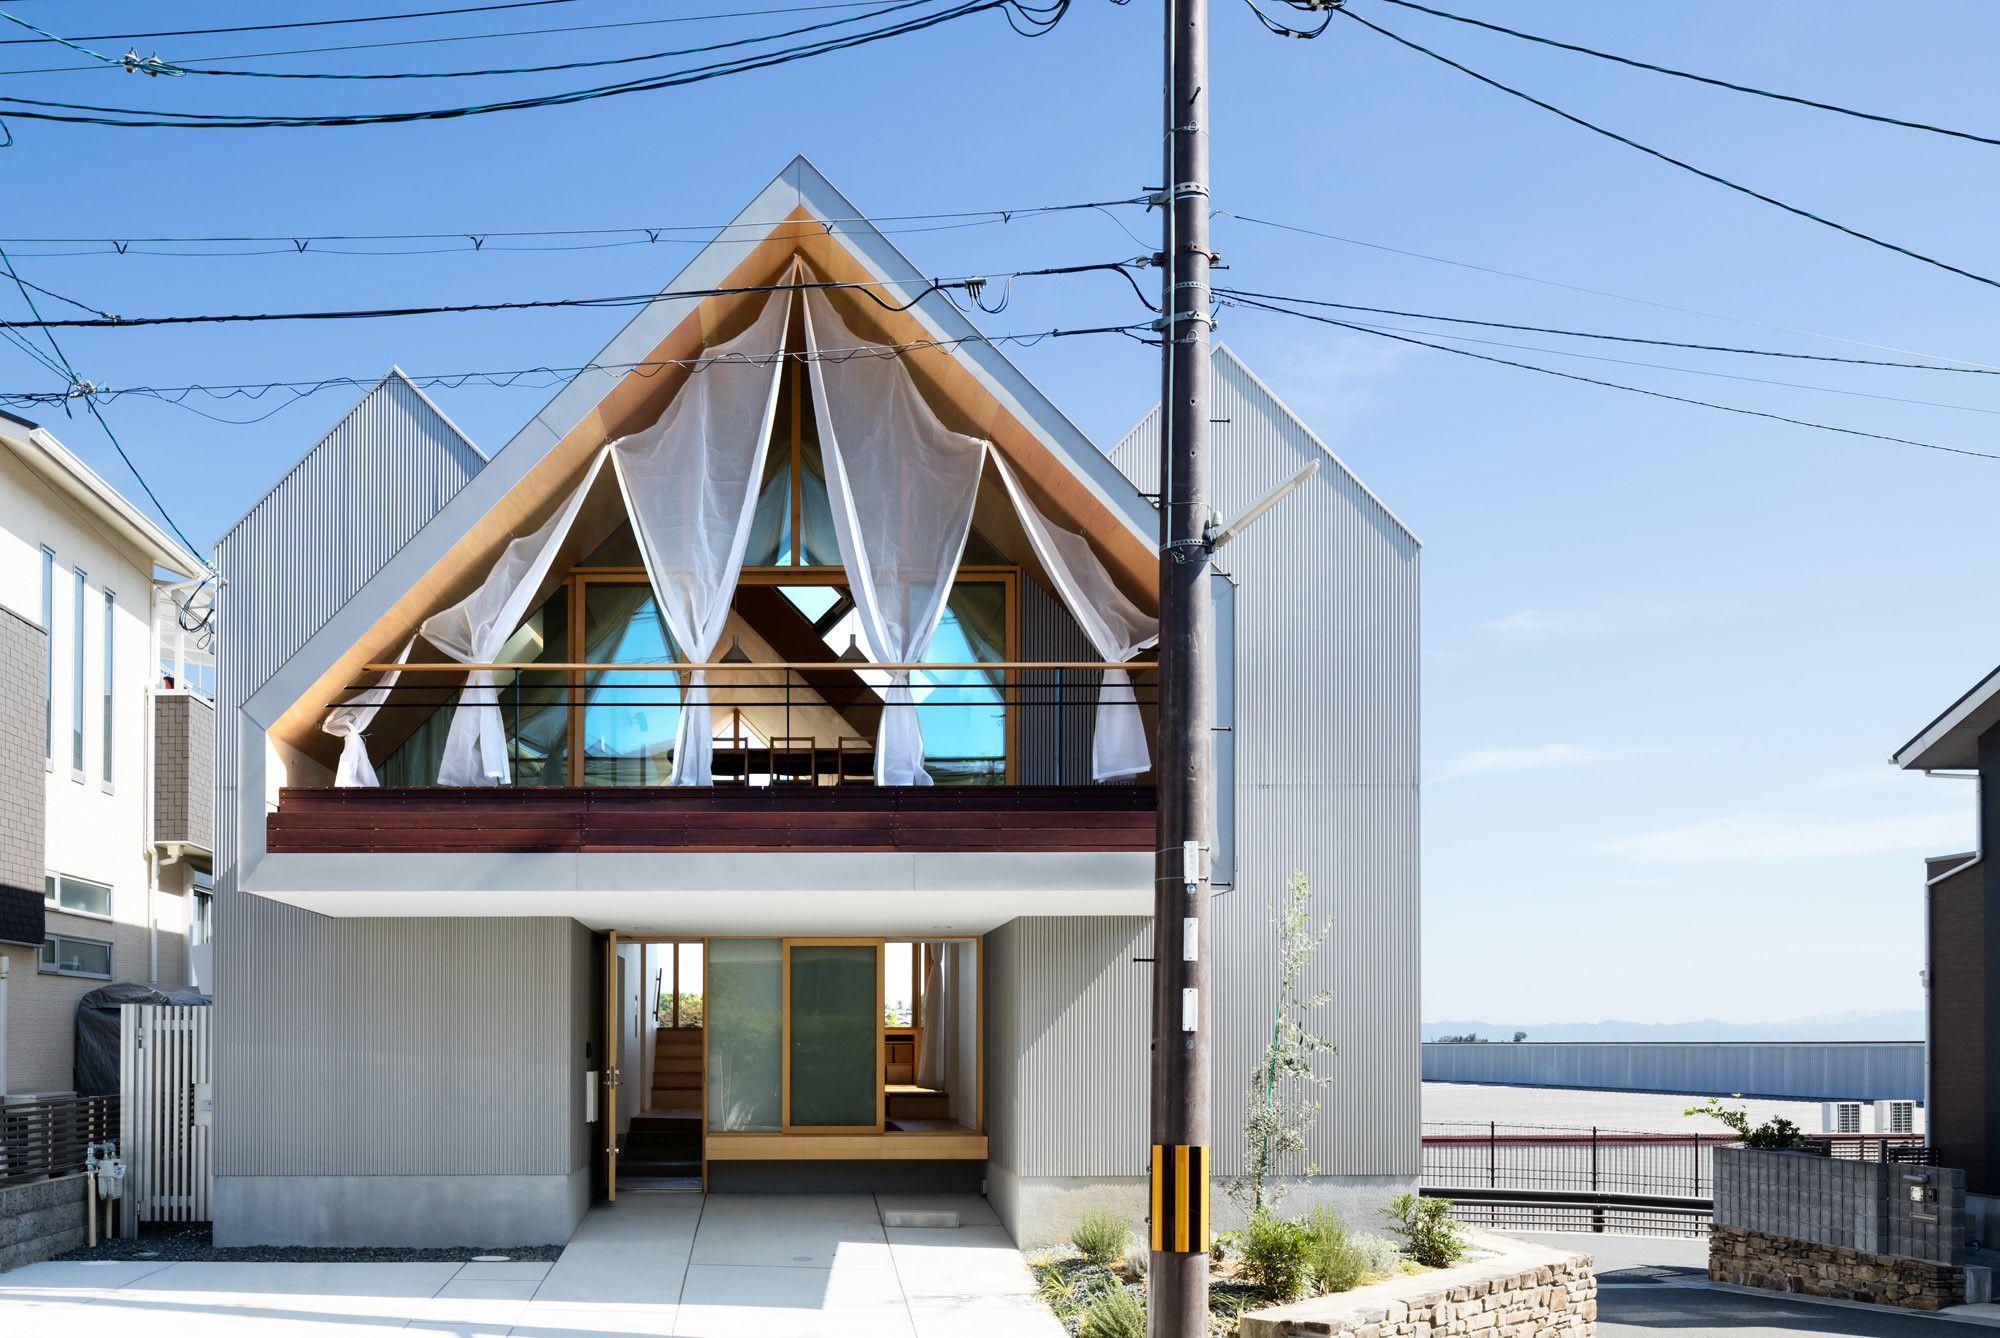 container home designers%0A Newtown House   Located Kyoto  Japan      Design by Kohei Yukawa   Hiroto  Kawaguchi   Photo by Yohei Sasakura